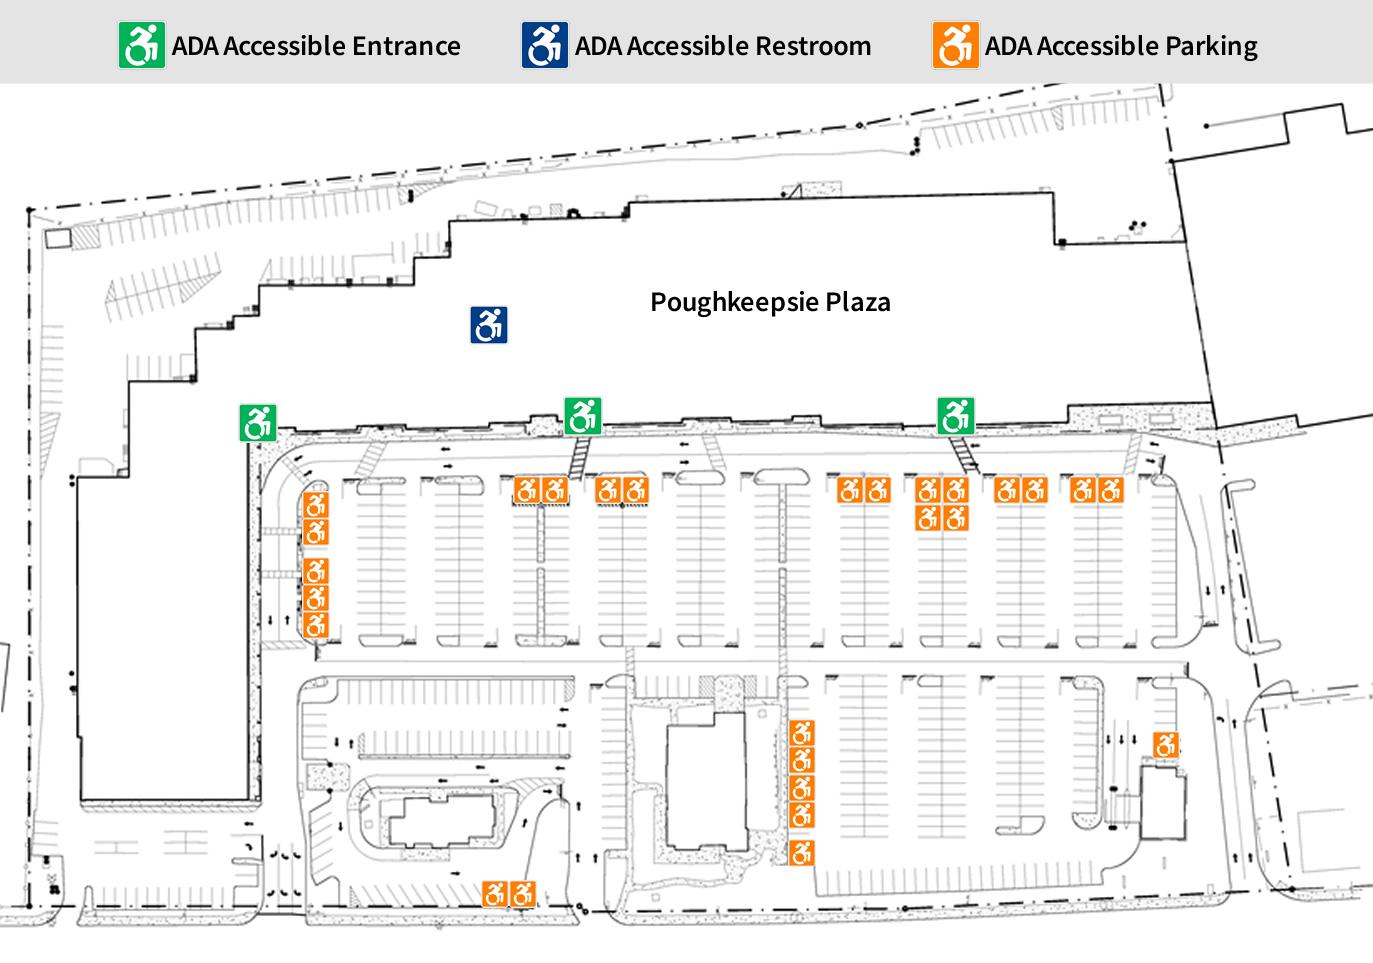 Poughkeepsie Plaza - ADA Accessibility